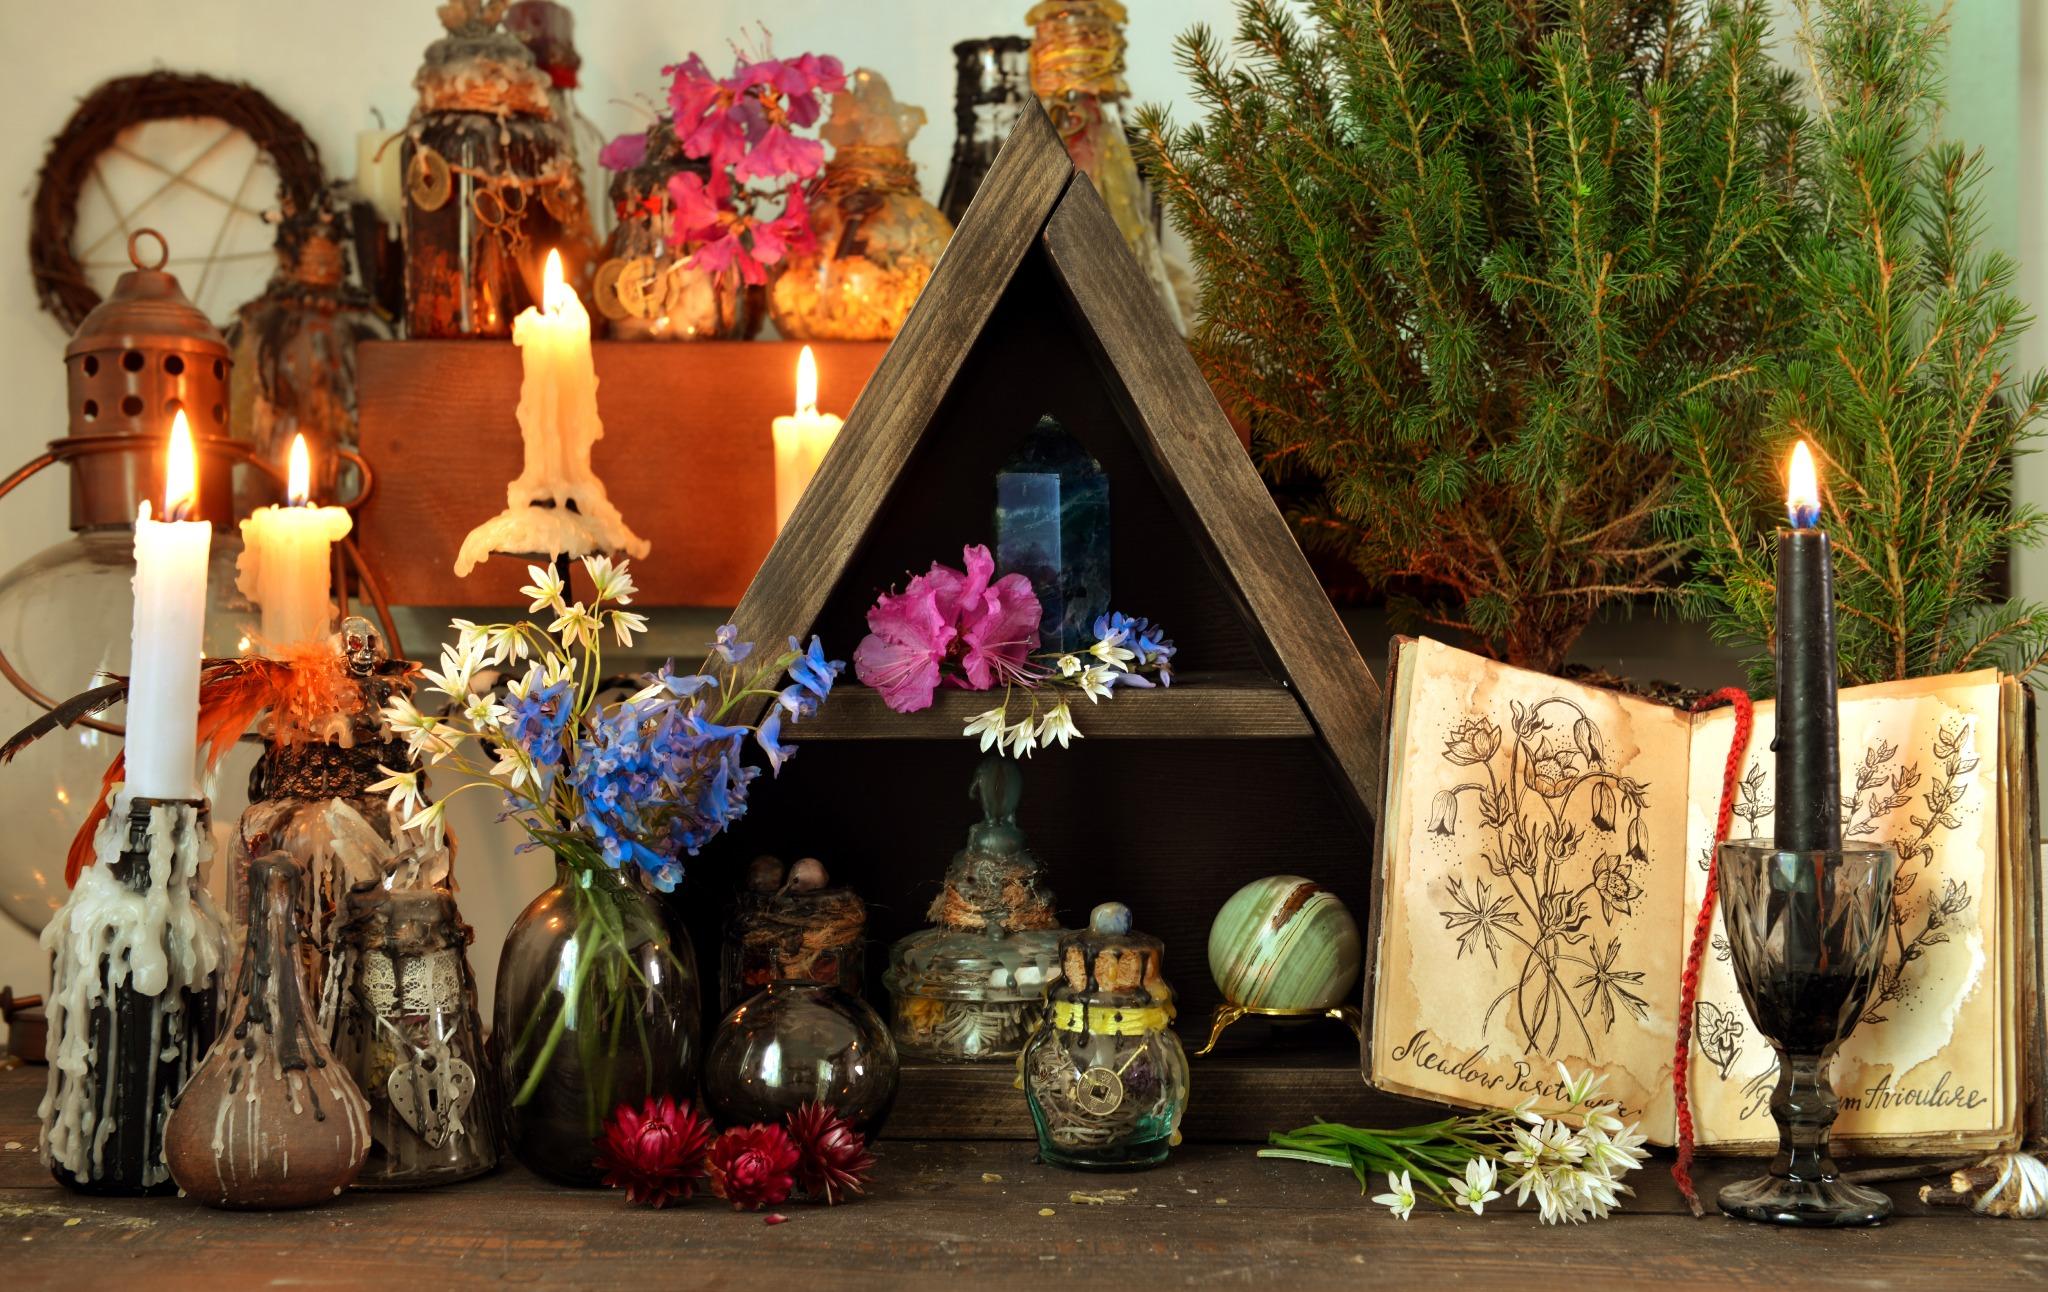 A shrine to celebrate Beltane.